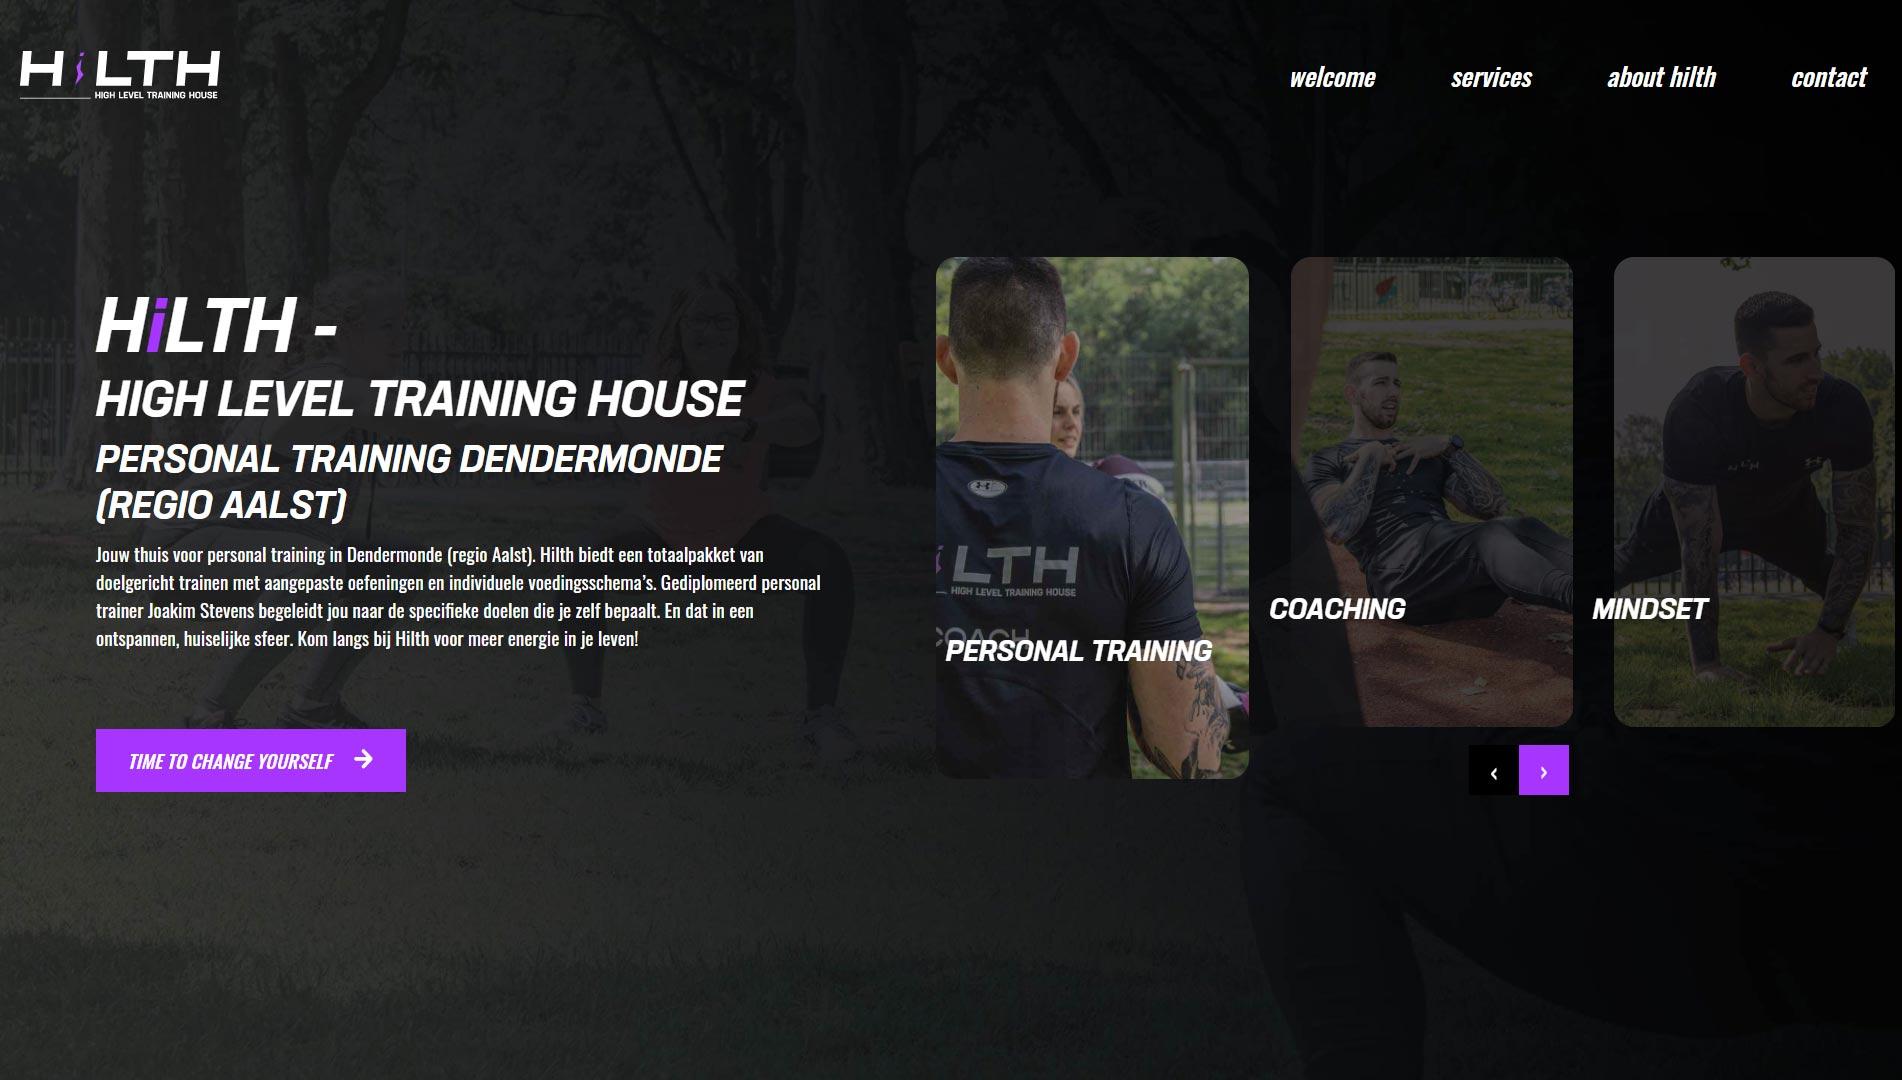 webdesign ontwerpen voor hilth personal training